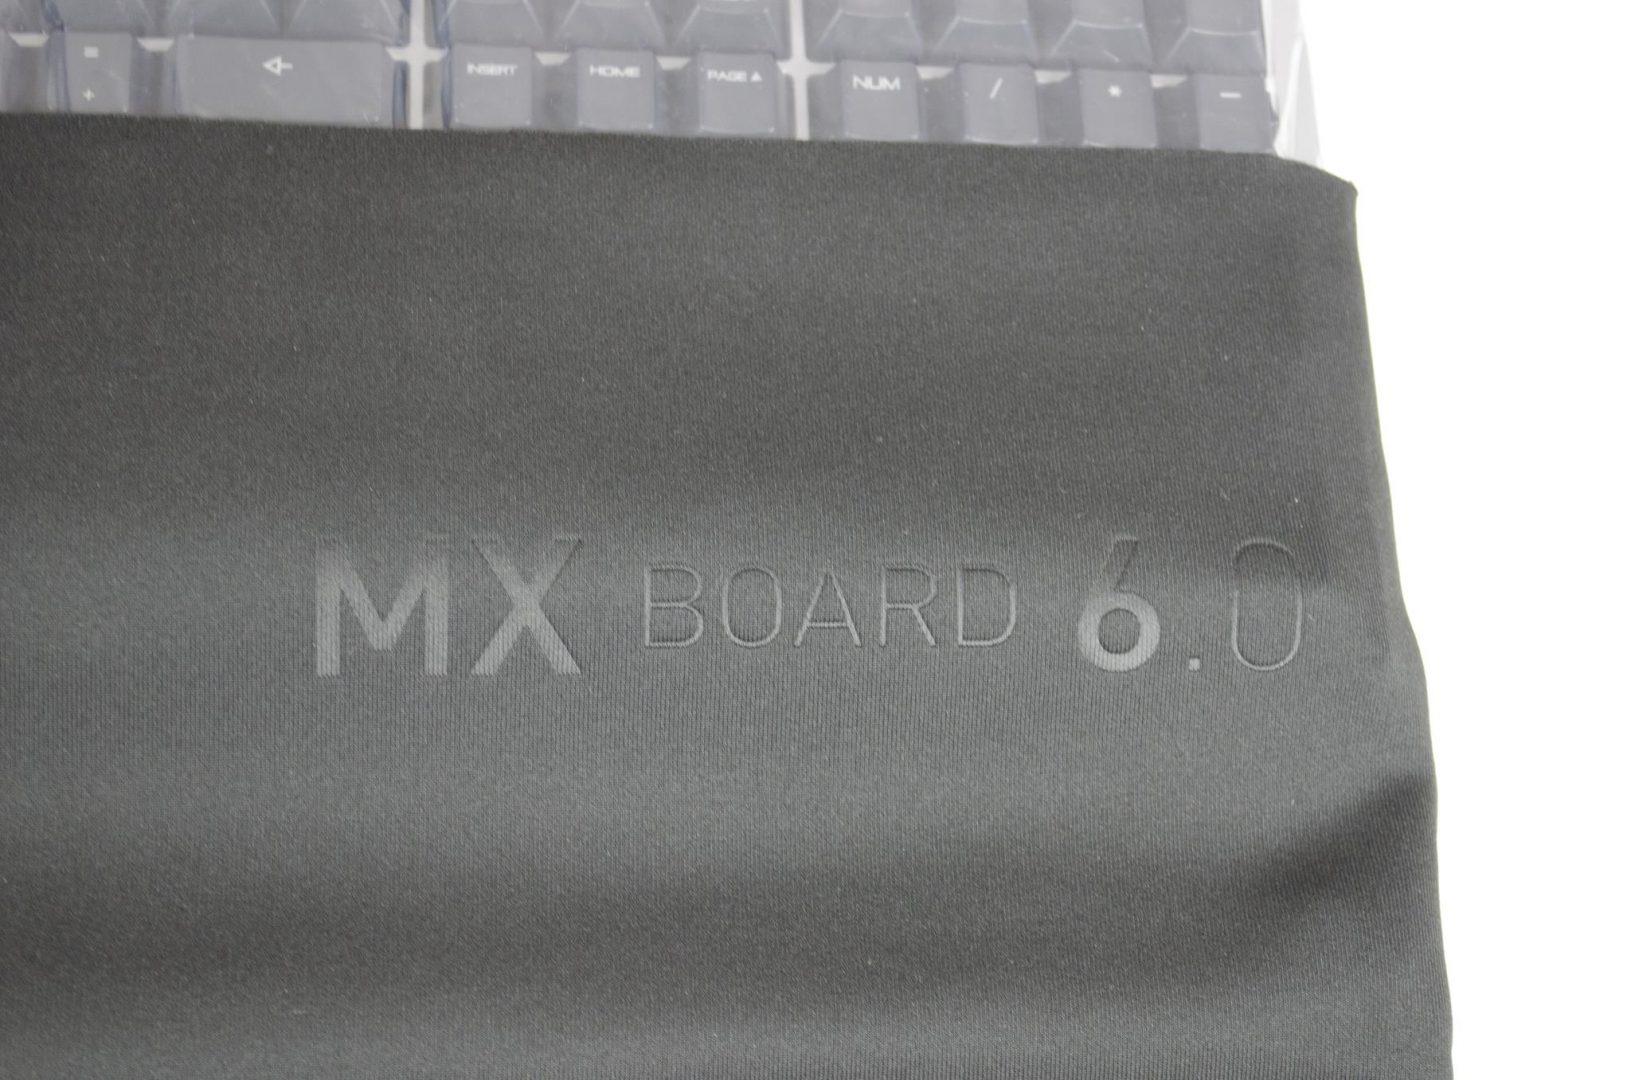 cherry mx-board 6 mechanical keyboard review_8